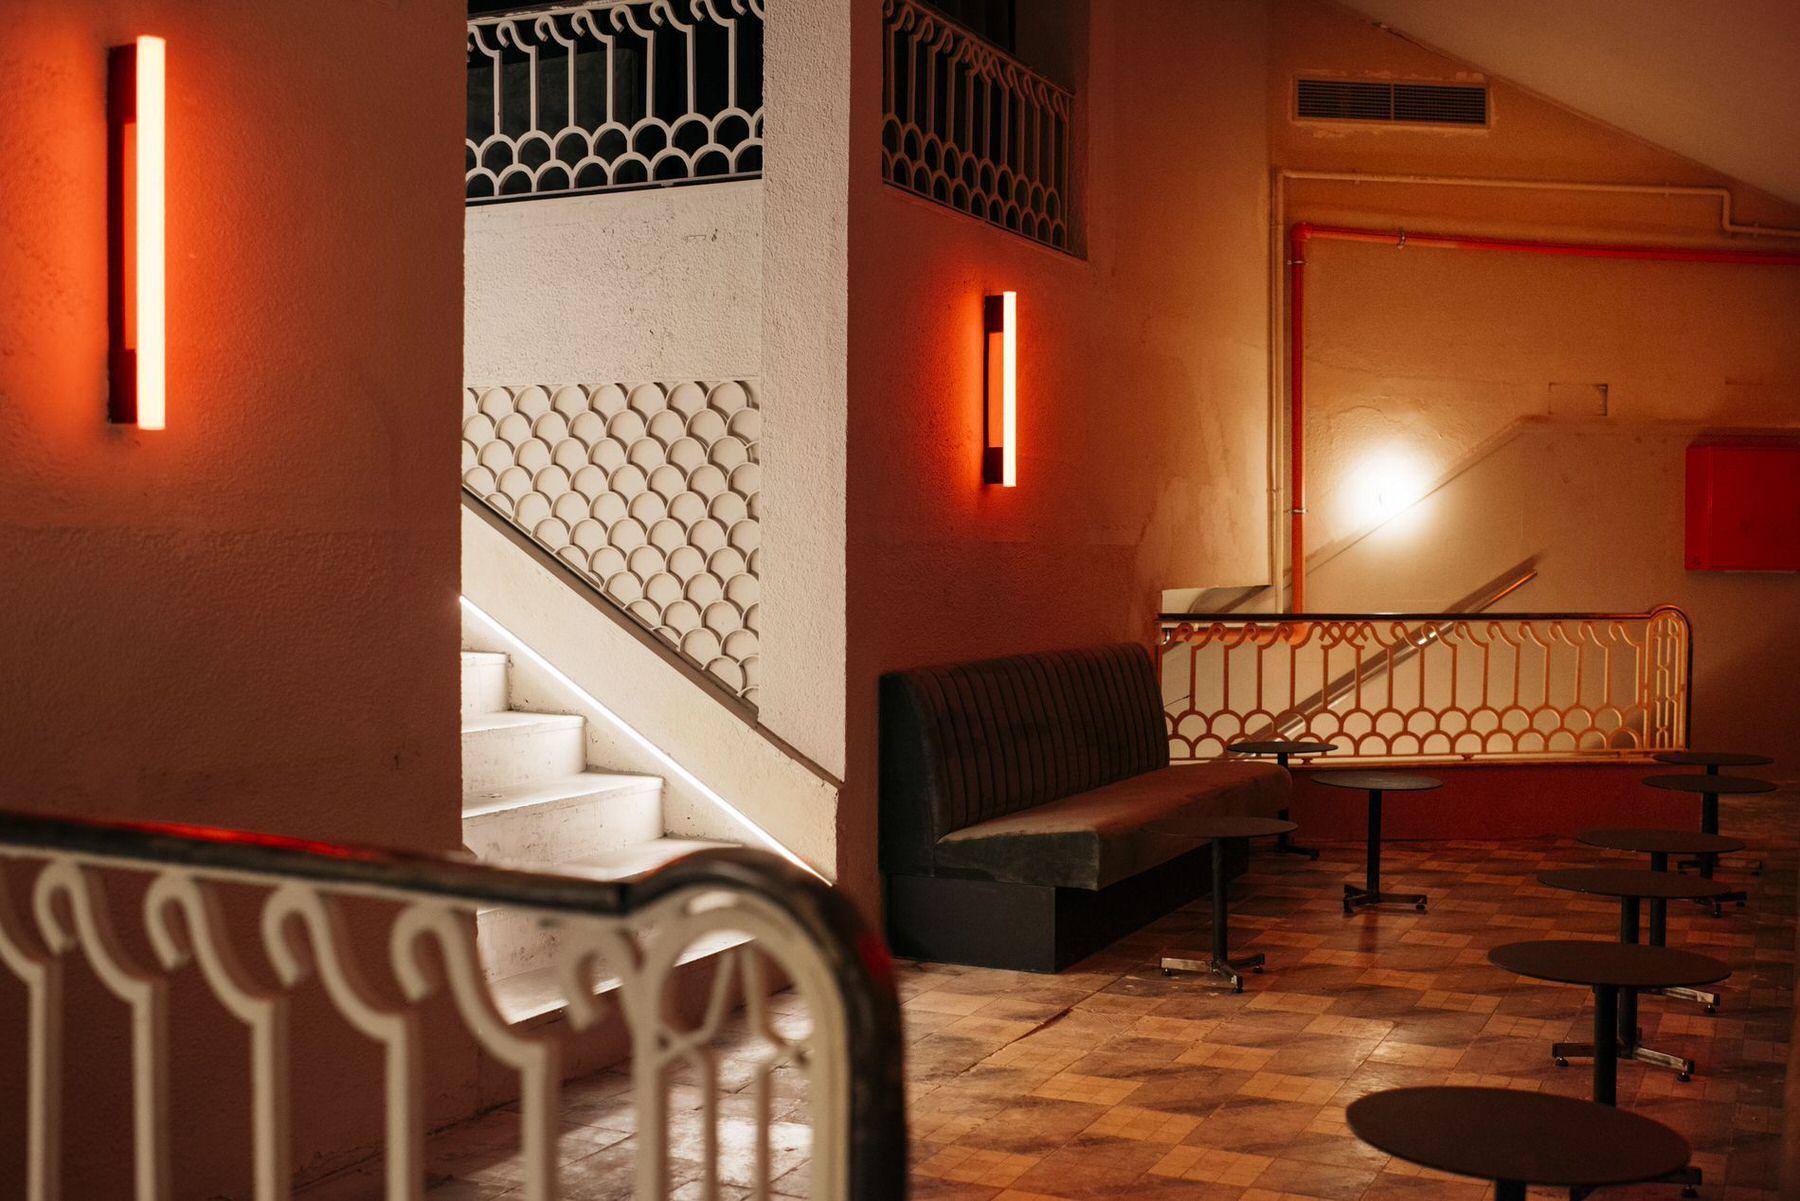 Sala Equis, Madrid Cinema Interiors, Plantea Estudio, Photo Lucia Marcano | Yellowtrace